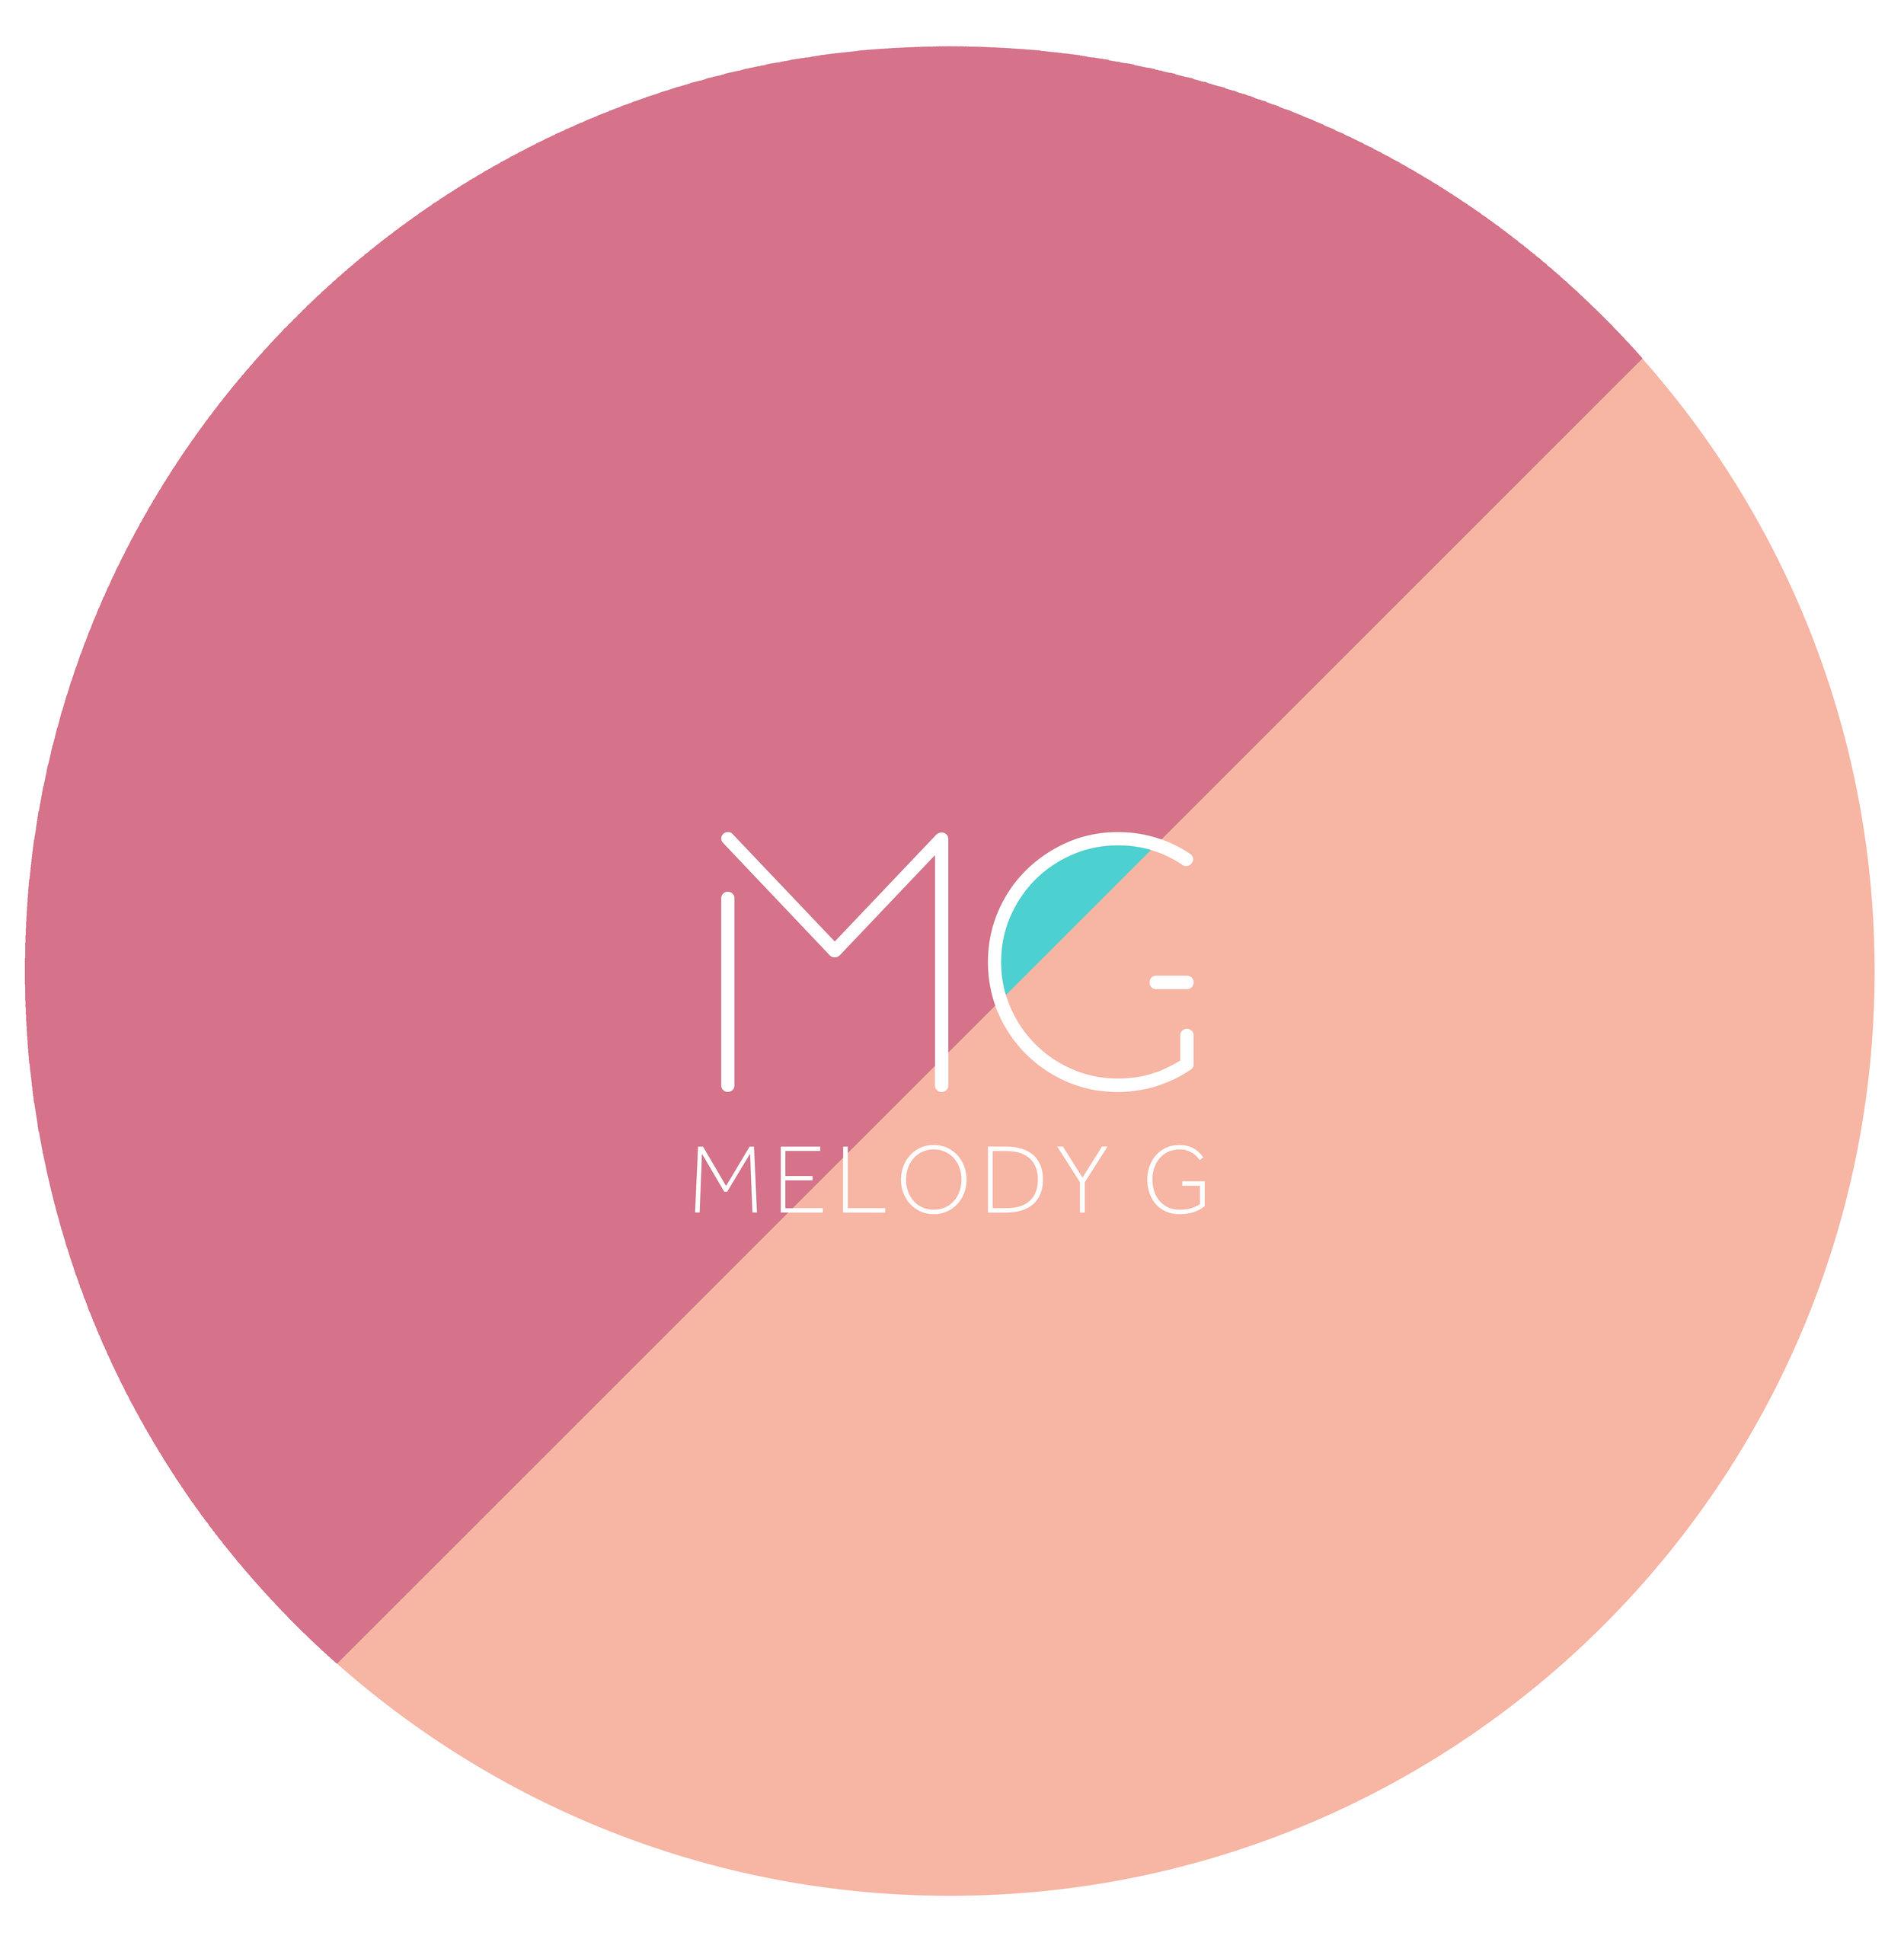 Melody G